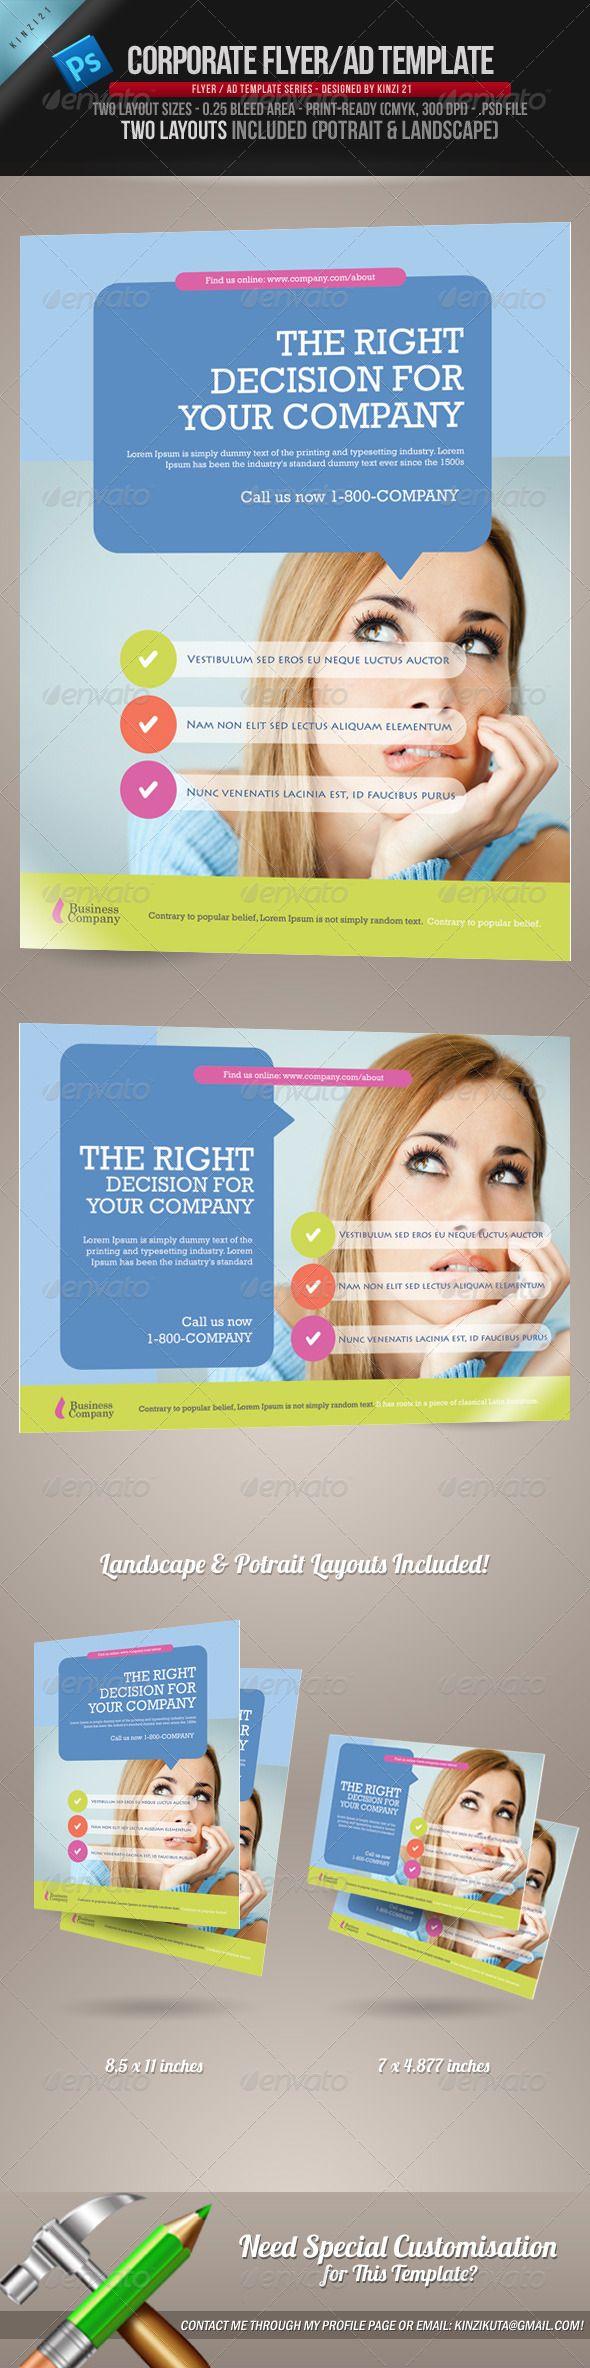 Corporate Flyer/Ad Template  Download info: http://graphicriver.net/item/corporate-flyerad-template/760636?r=kinzi21